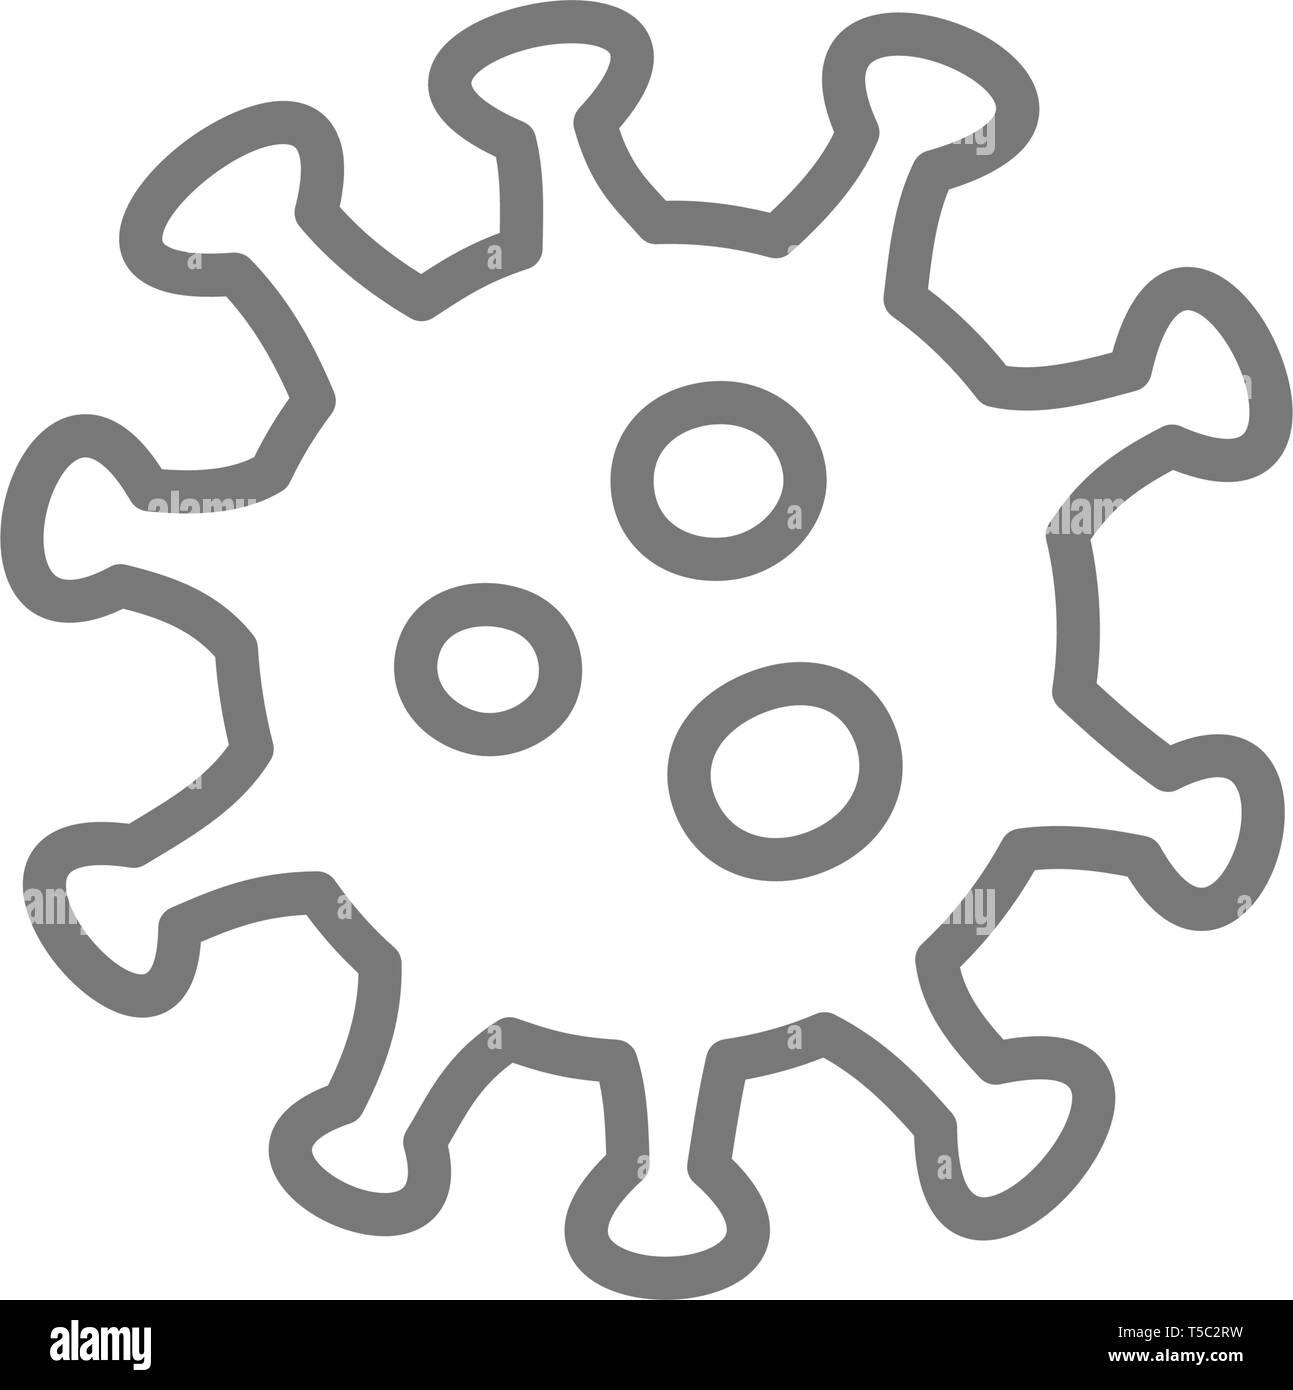 Virus, microbe, bacteria line icon. - Stock Image